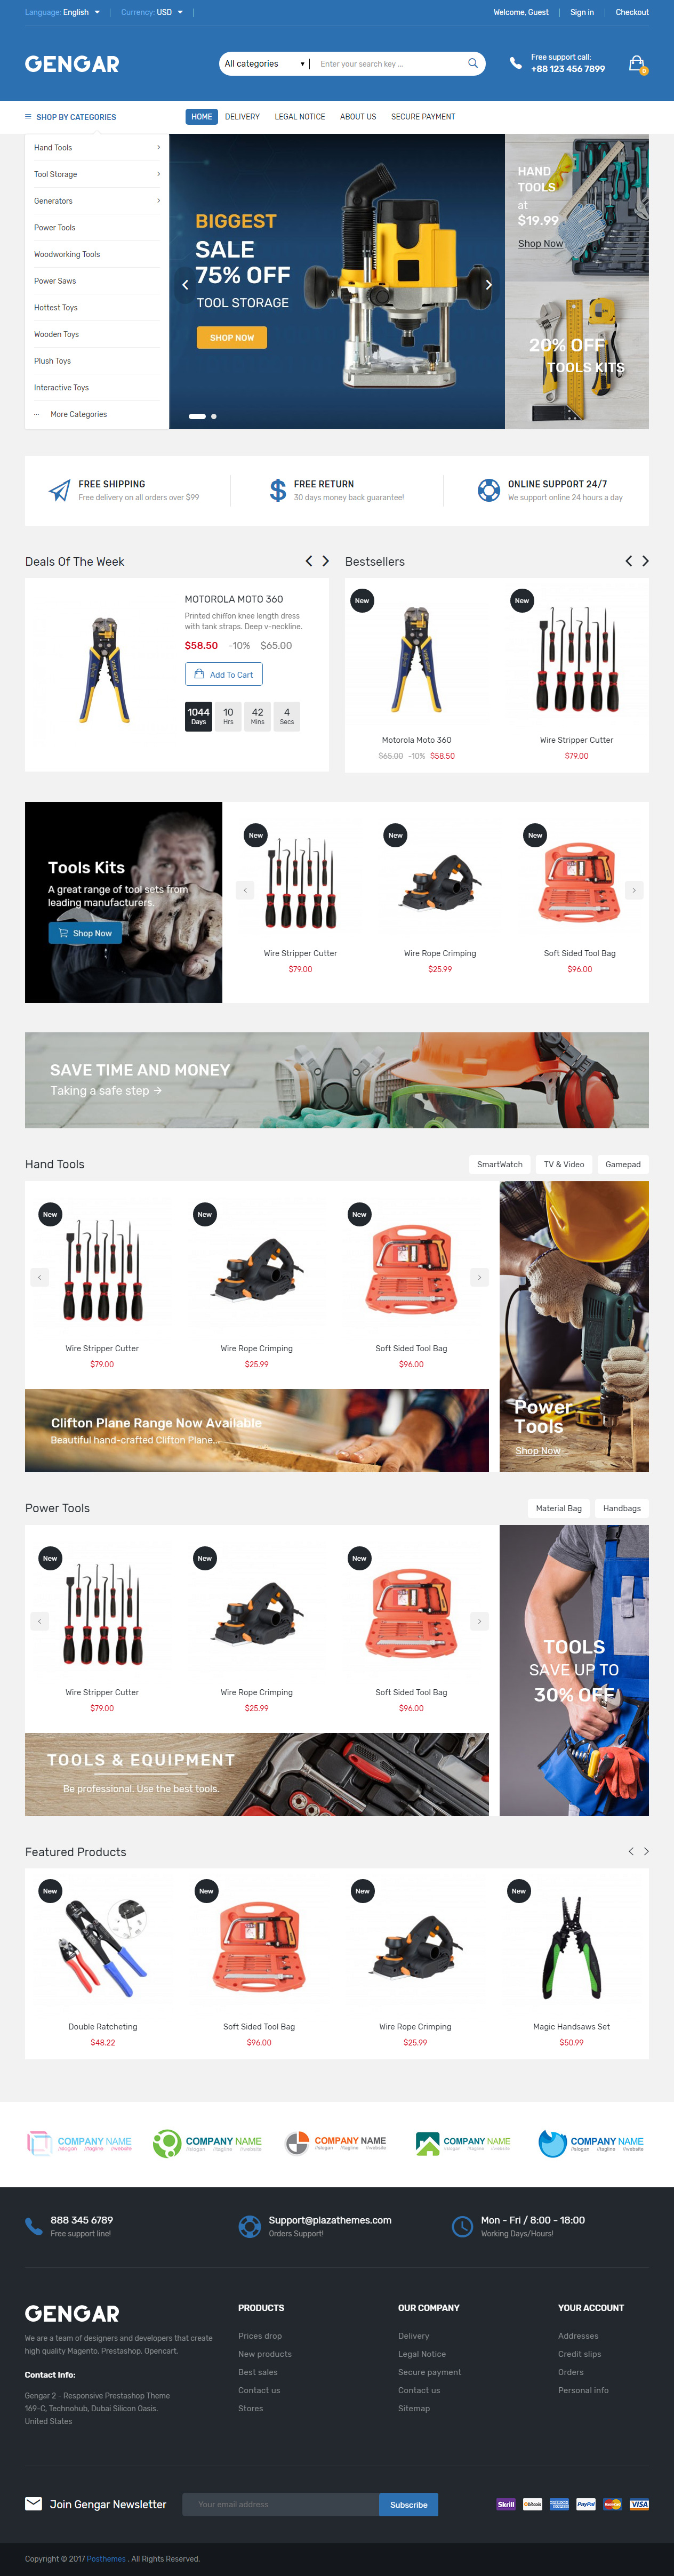 Gengar Premium Responsive Multipurpose Prestashop 1 7 Theme